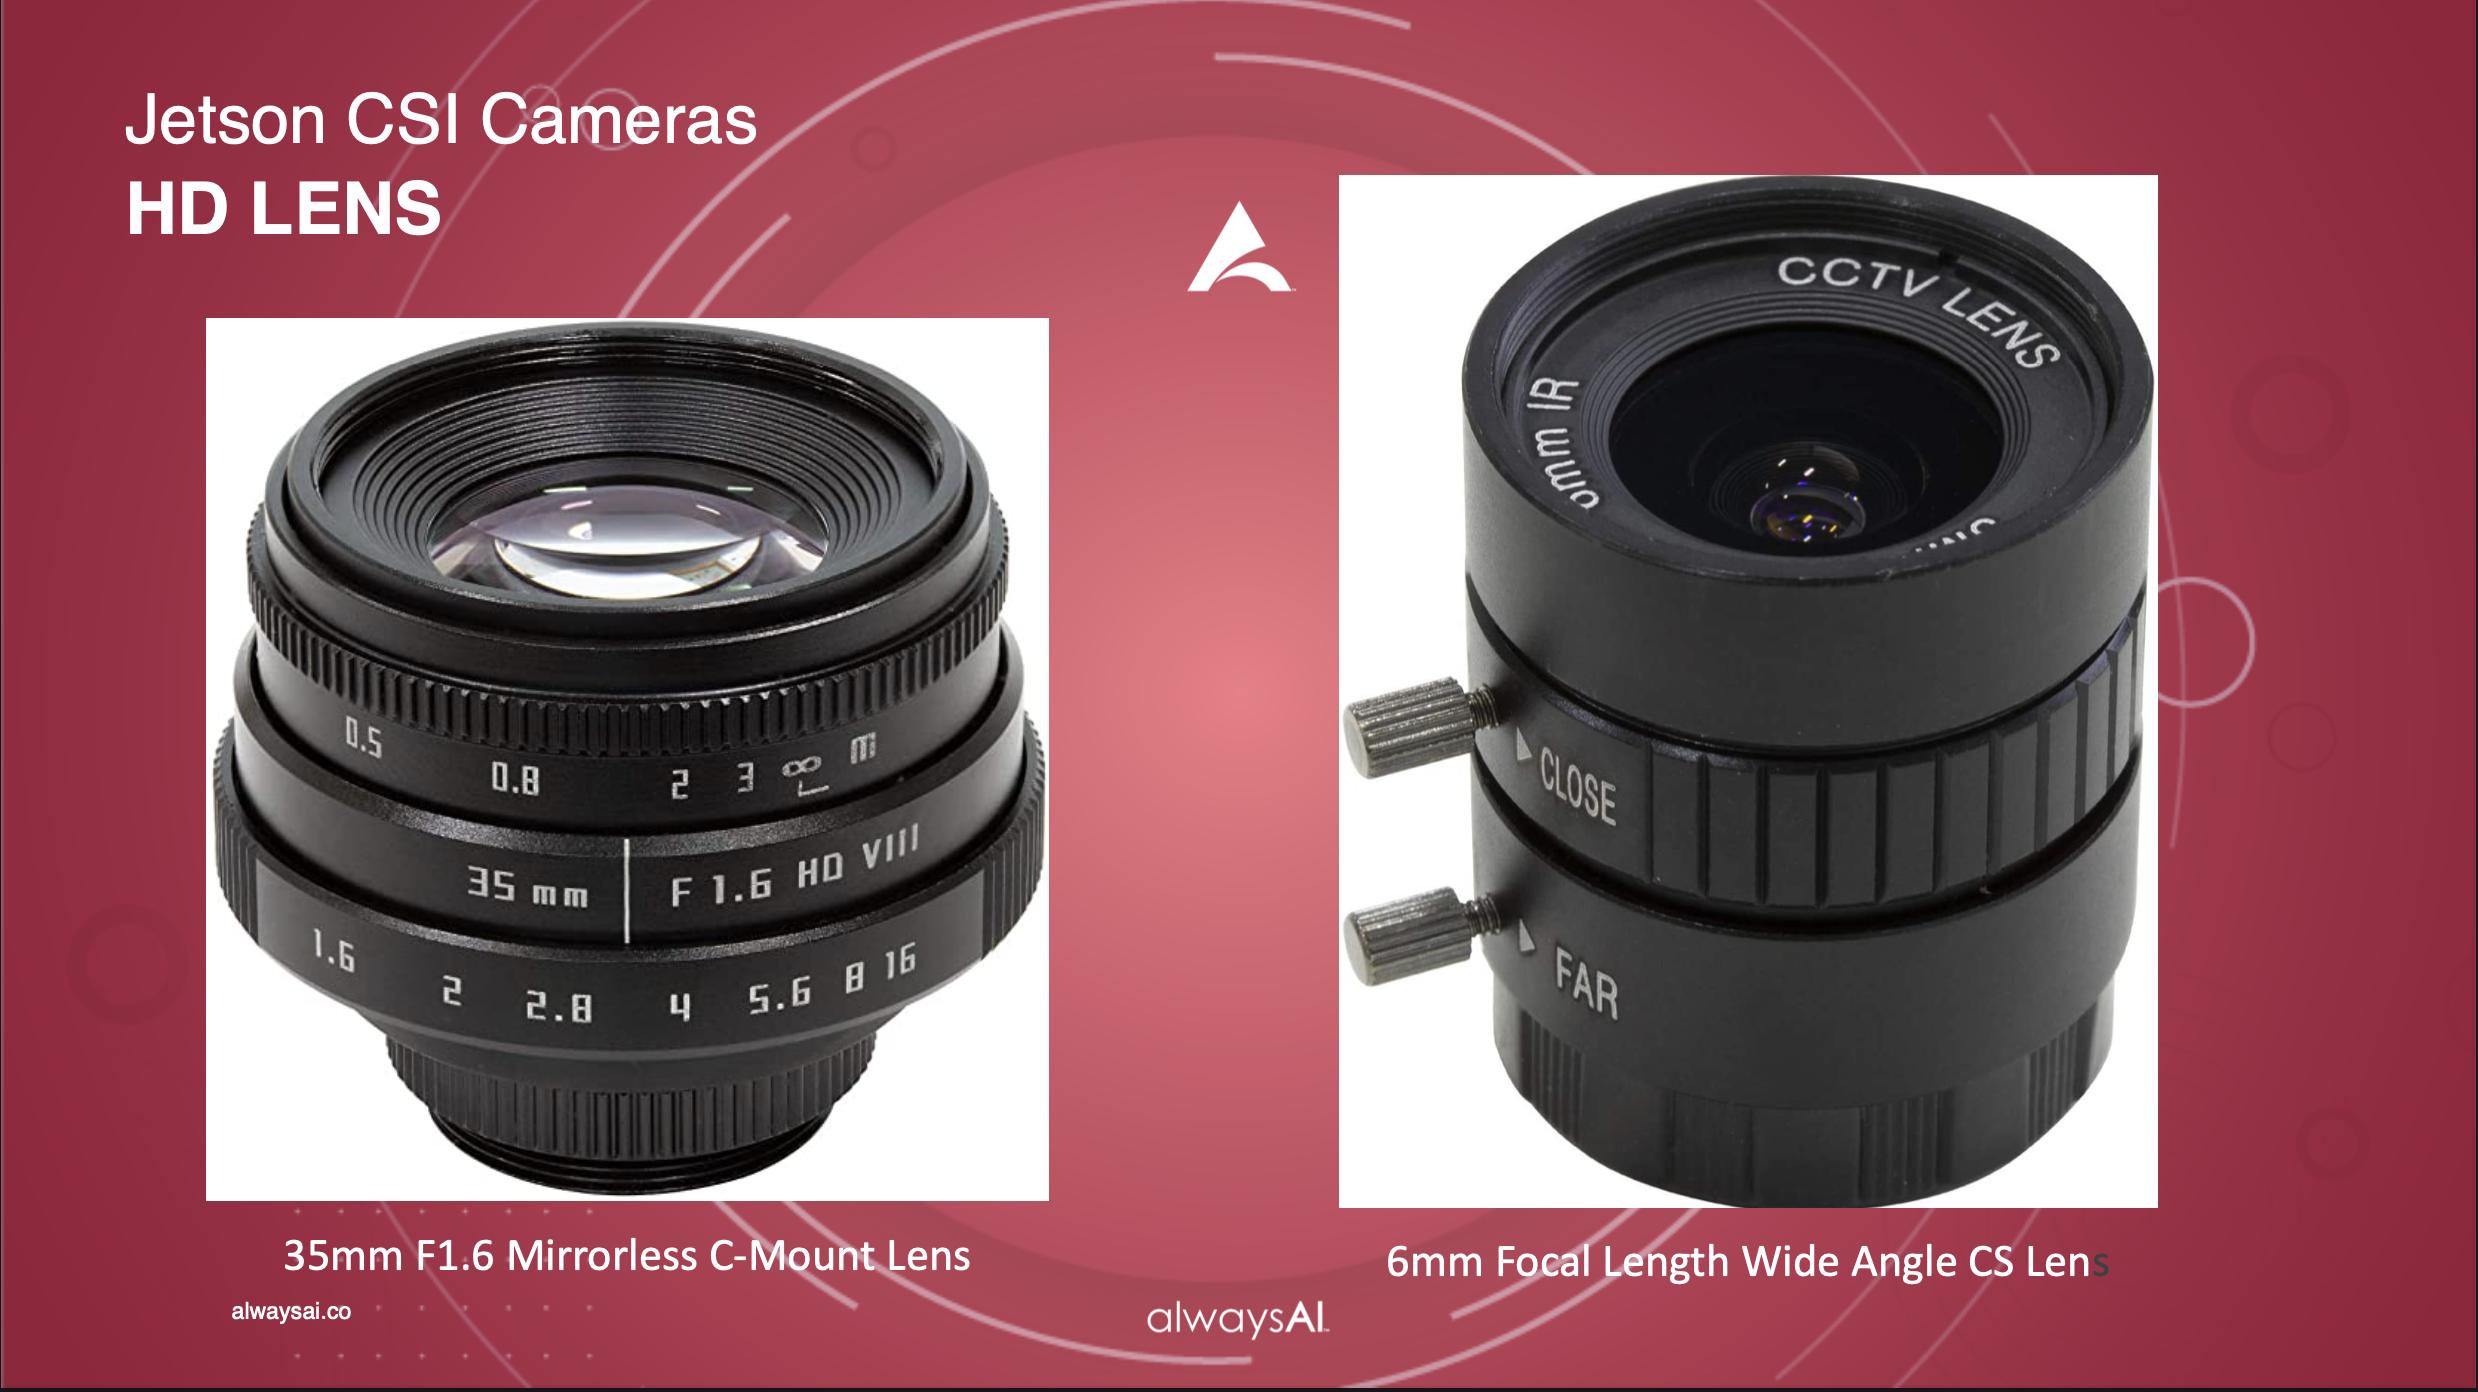 Jetson CSI Cameras HD Lens Comparisons